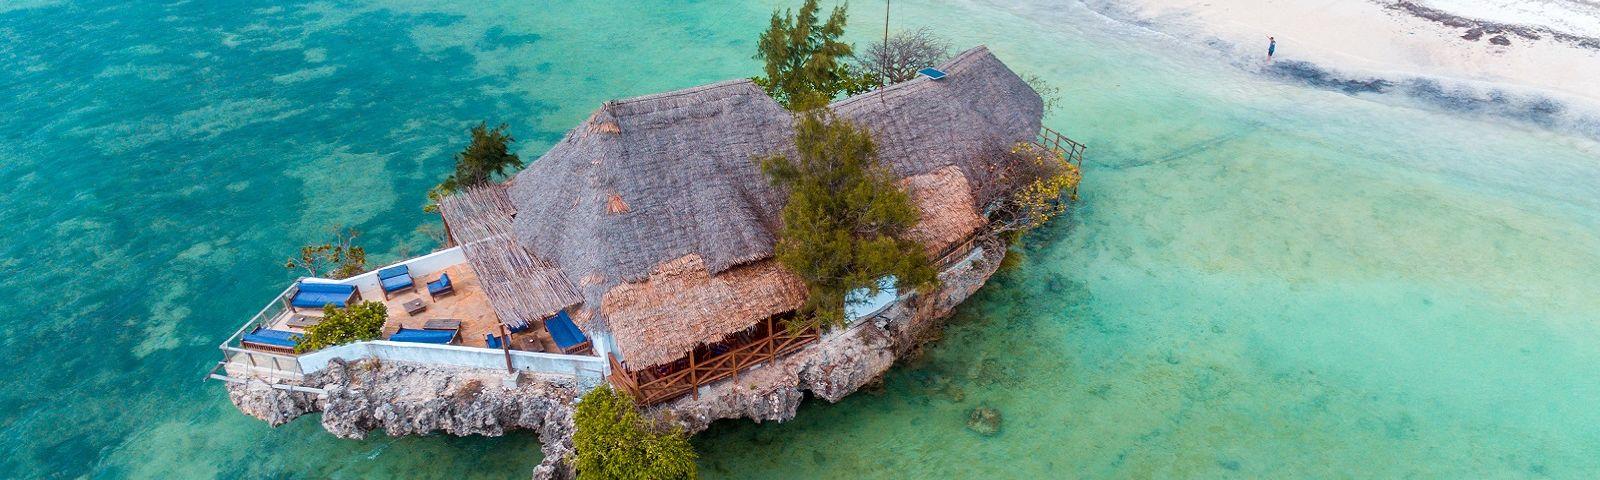 Zanzibar Restaurant Guide